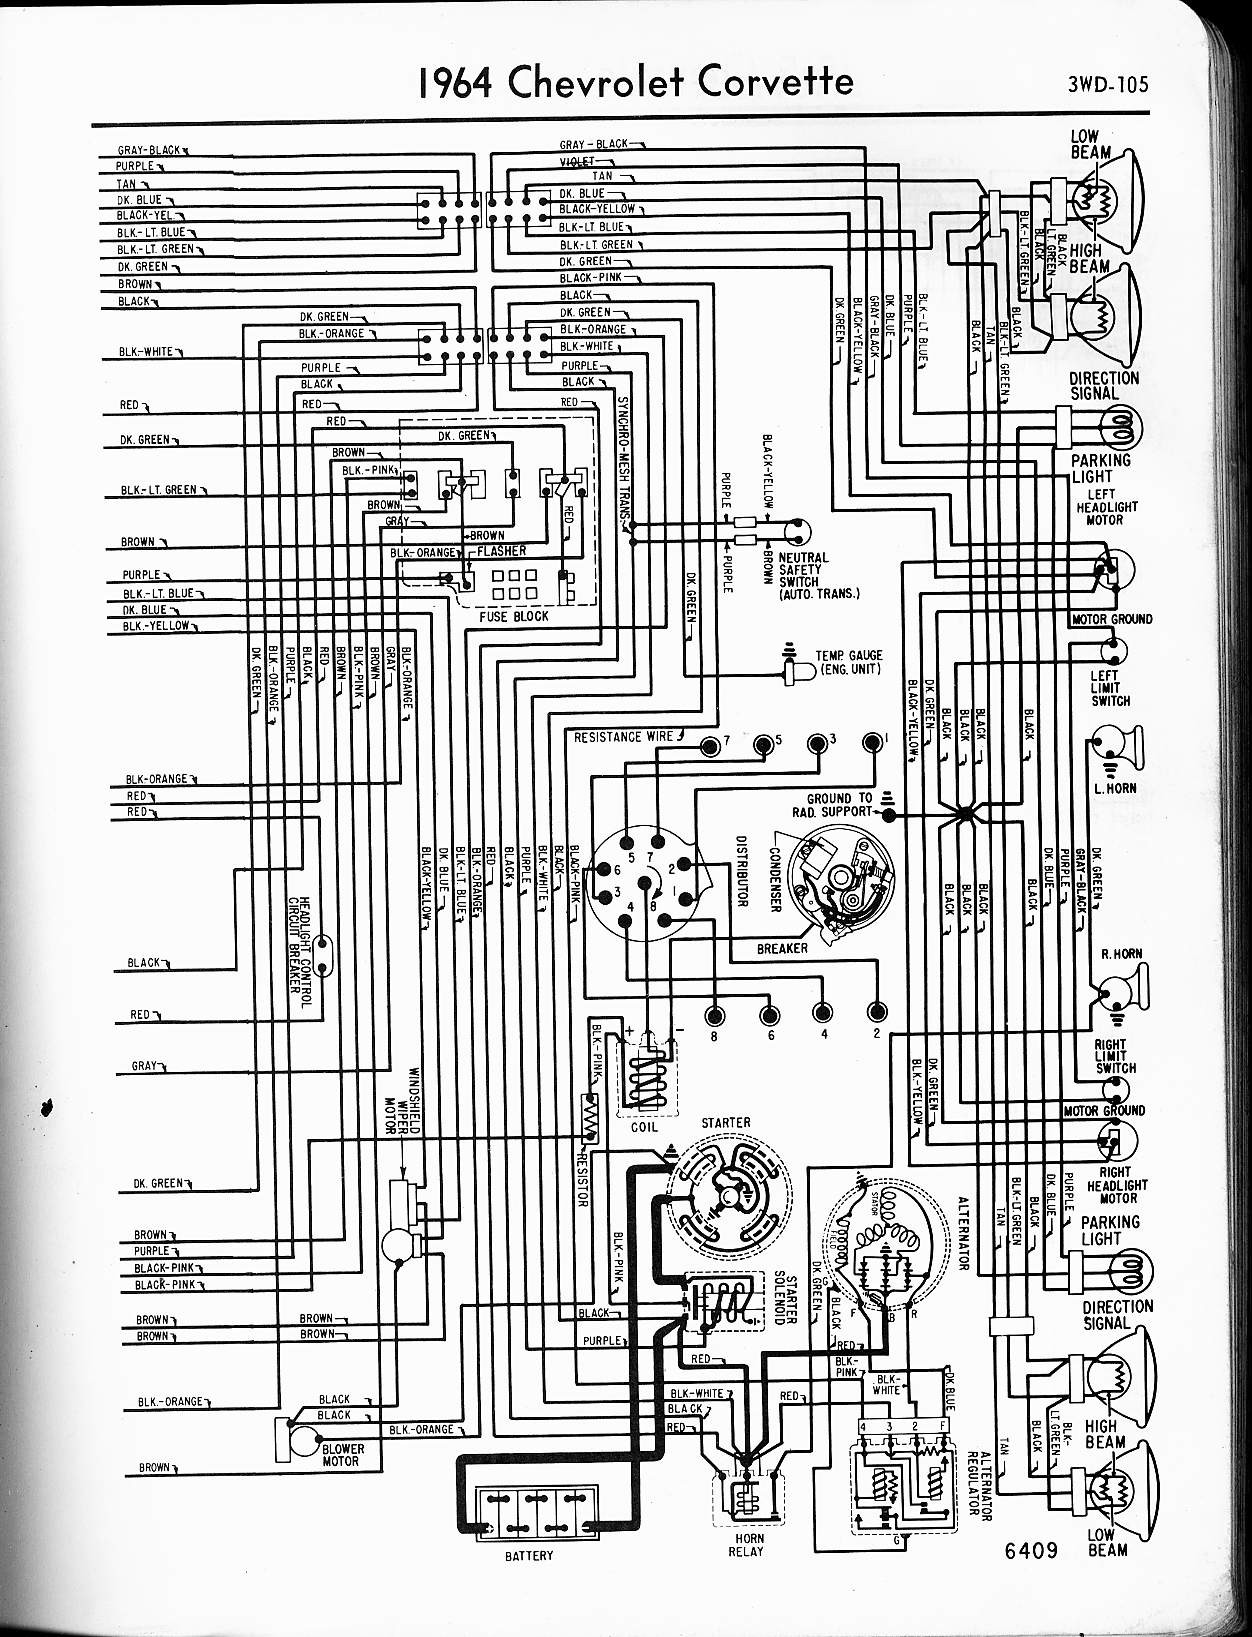 1964 Impala Ss Wiring Harness Diagram Schematics 2007 Chevy 2005 Engine Chevrolet Sedan